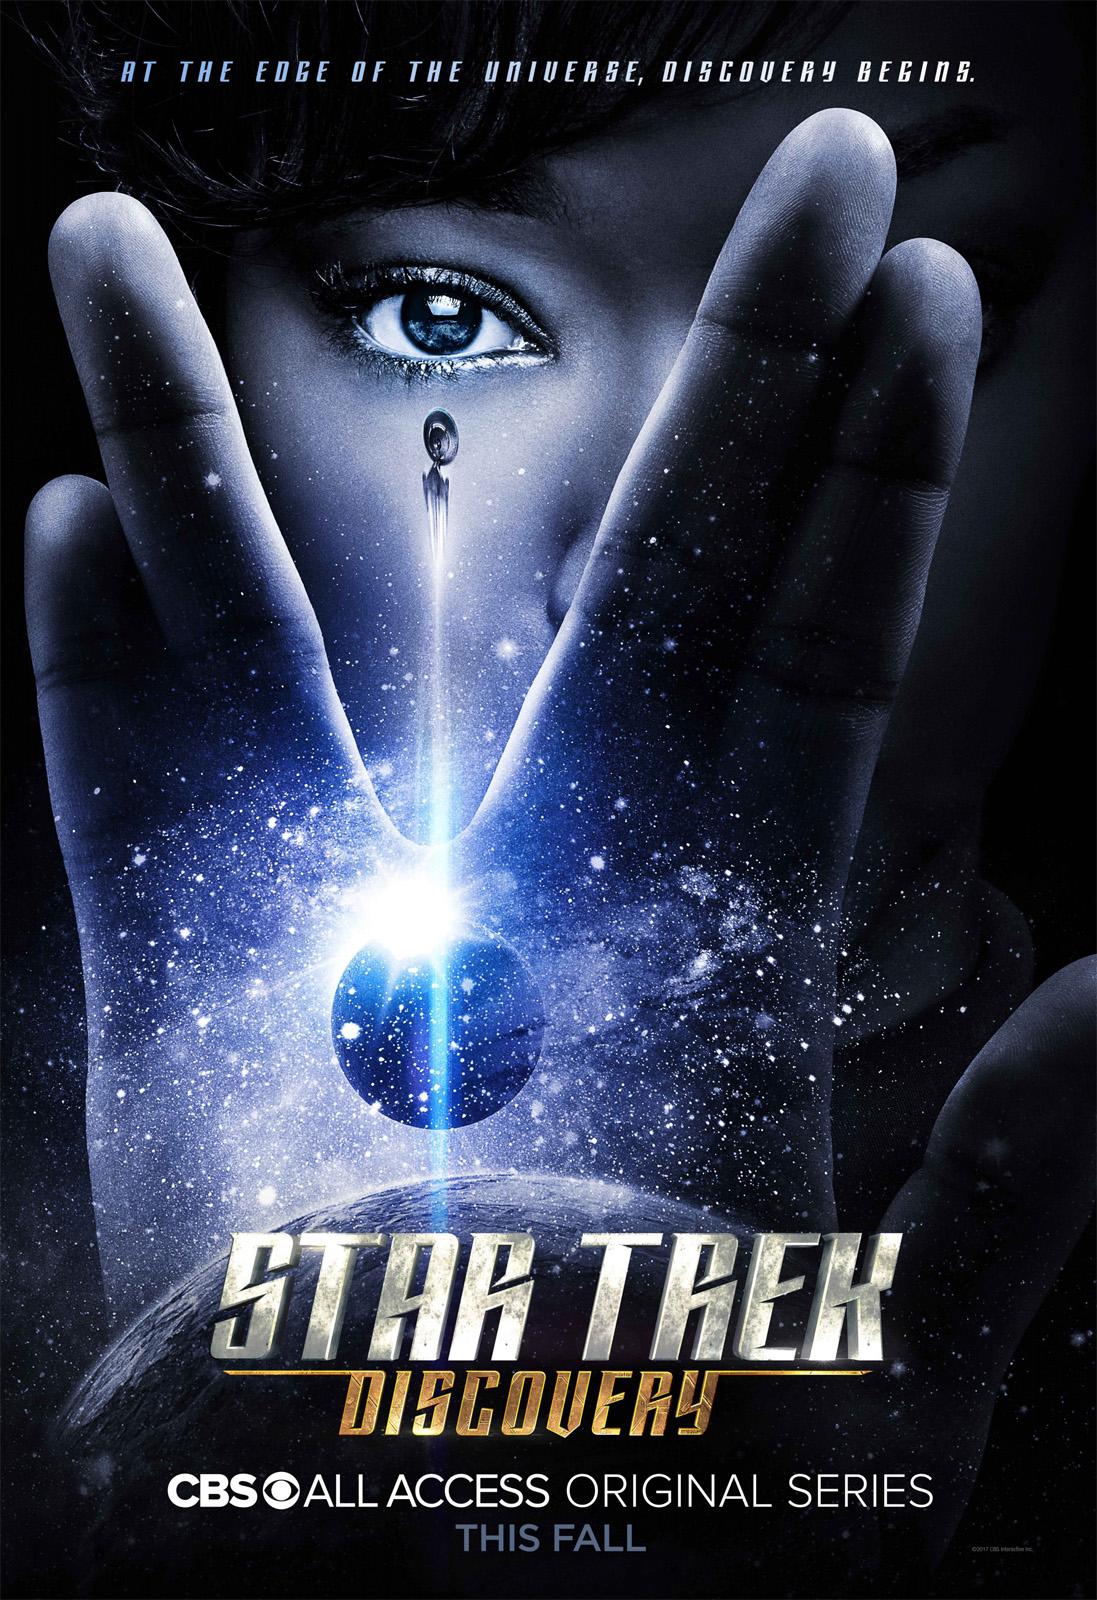 42 - Star Trek: Discovery